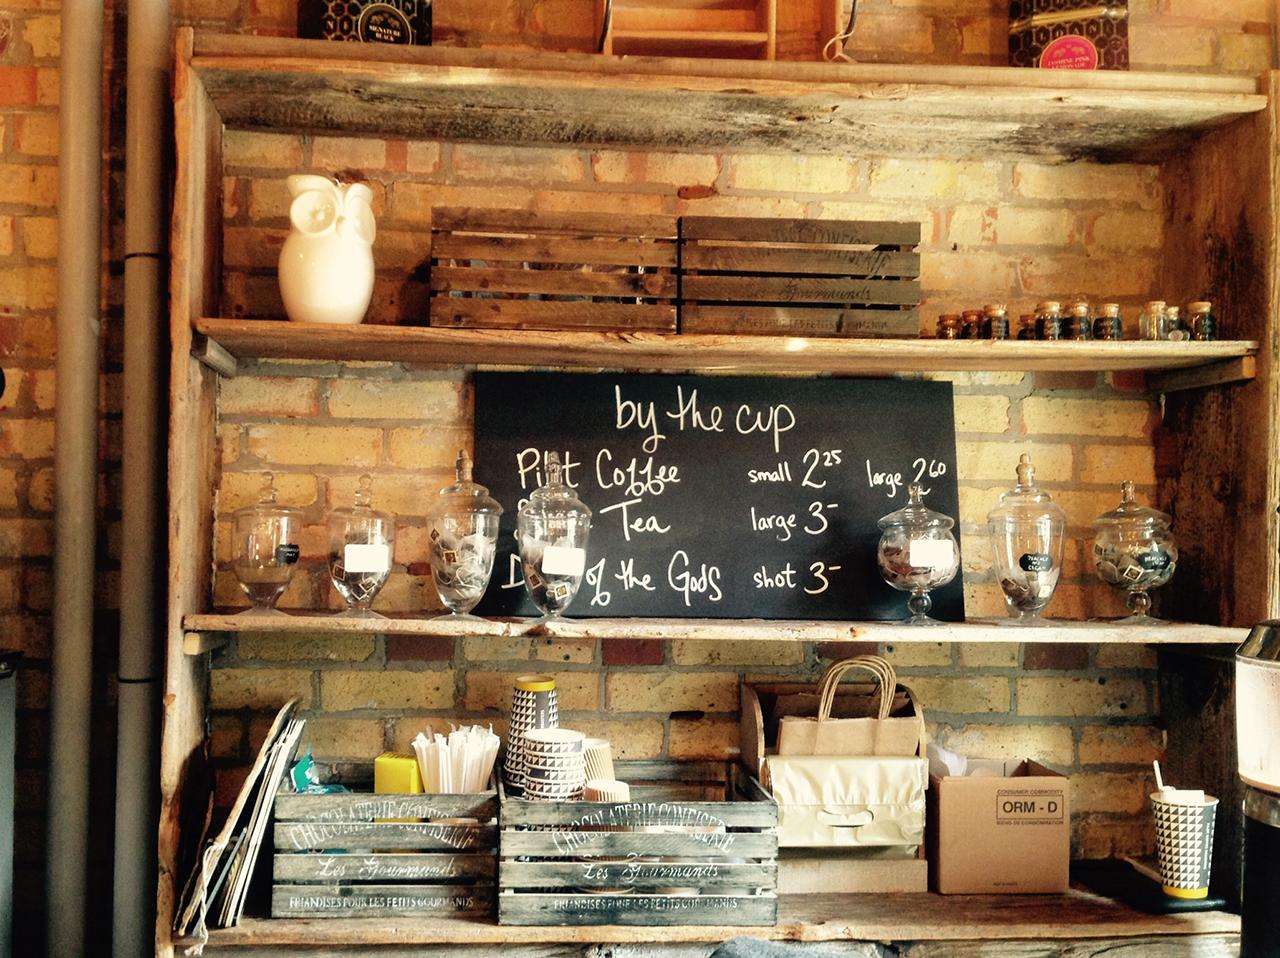 cafe-tour-804